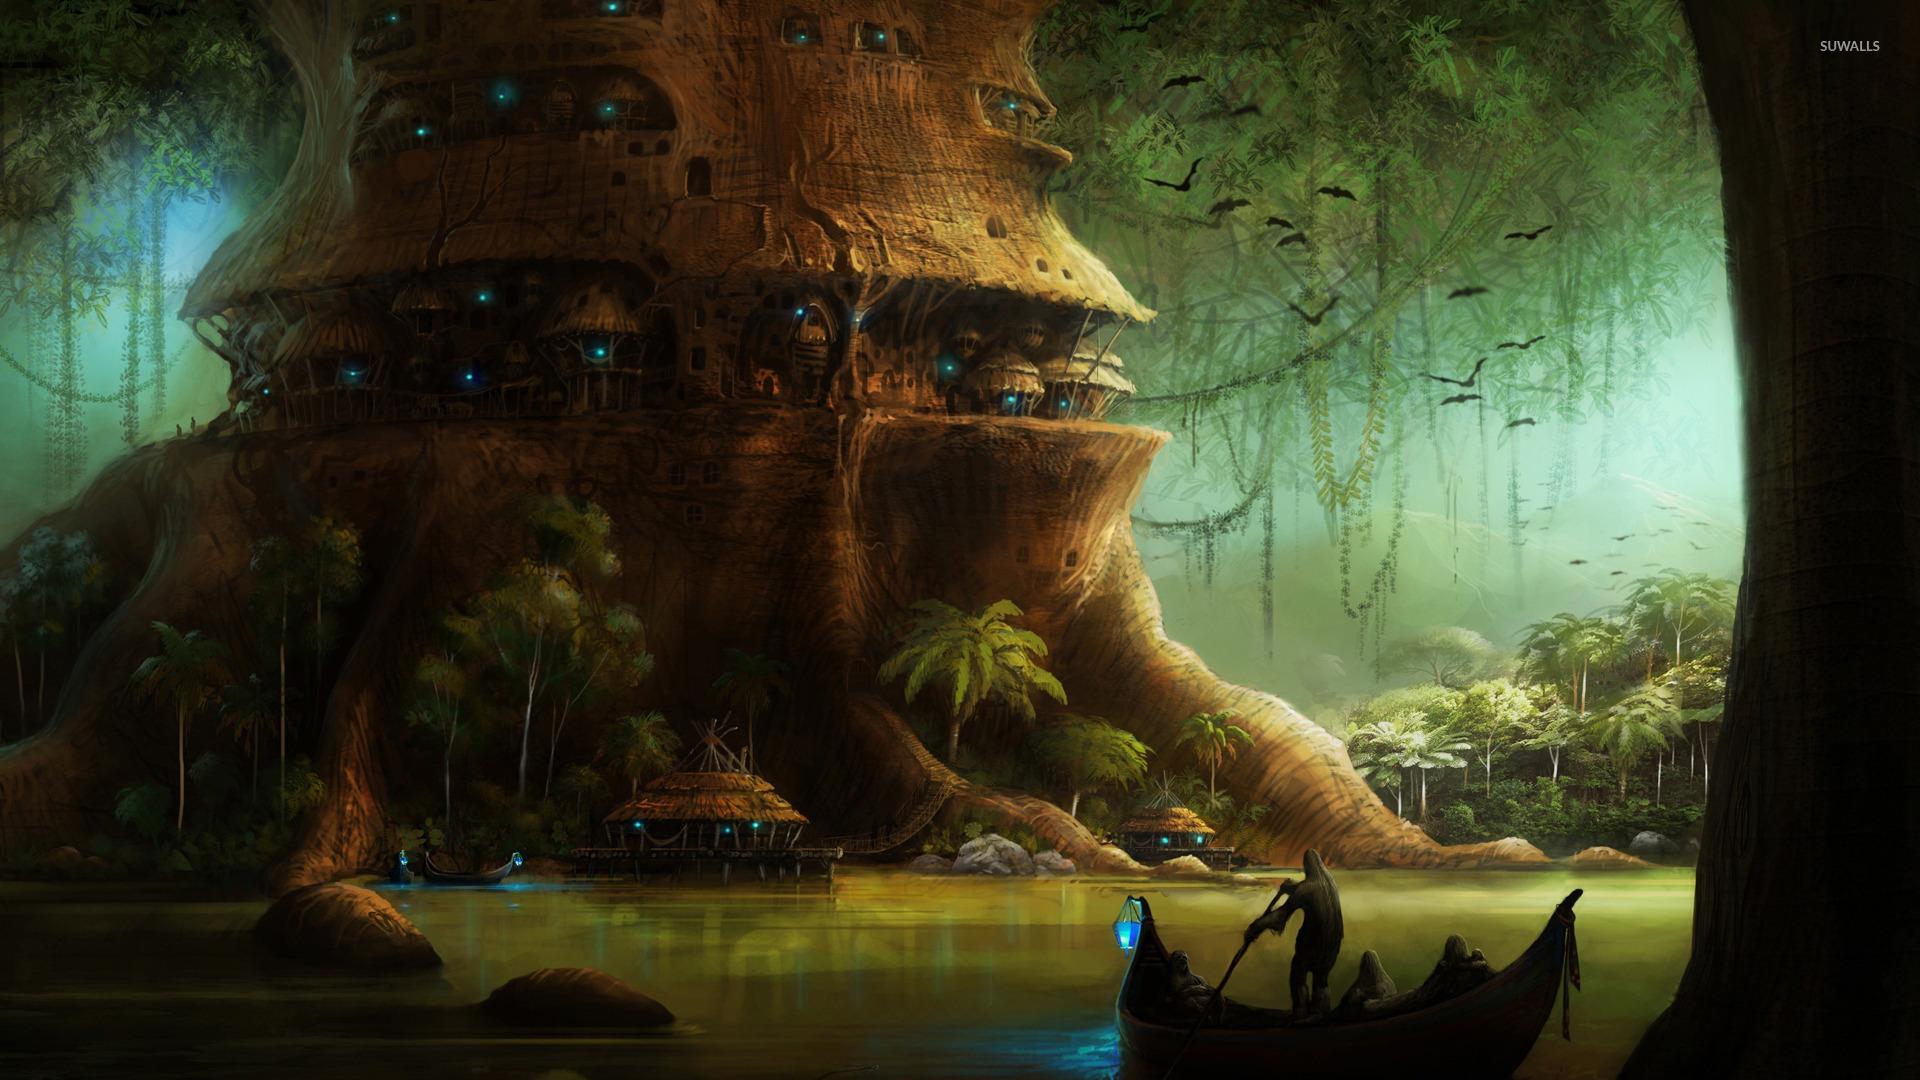 Village In A Tree Wallpaper Fantasy Wallpapers 17098